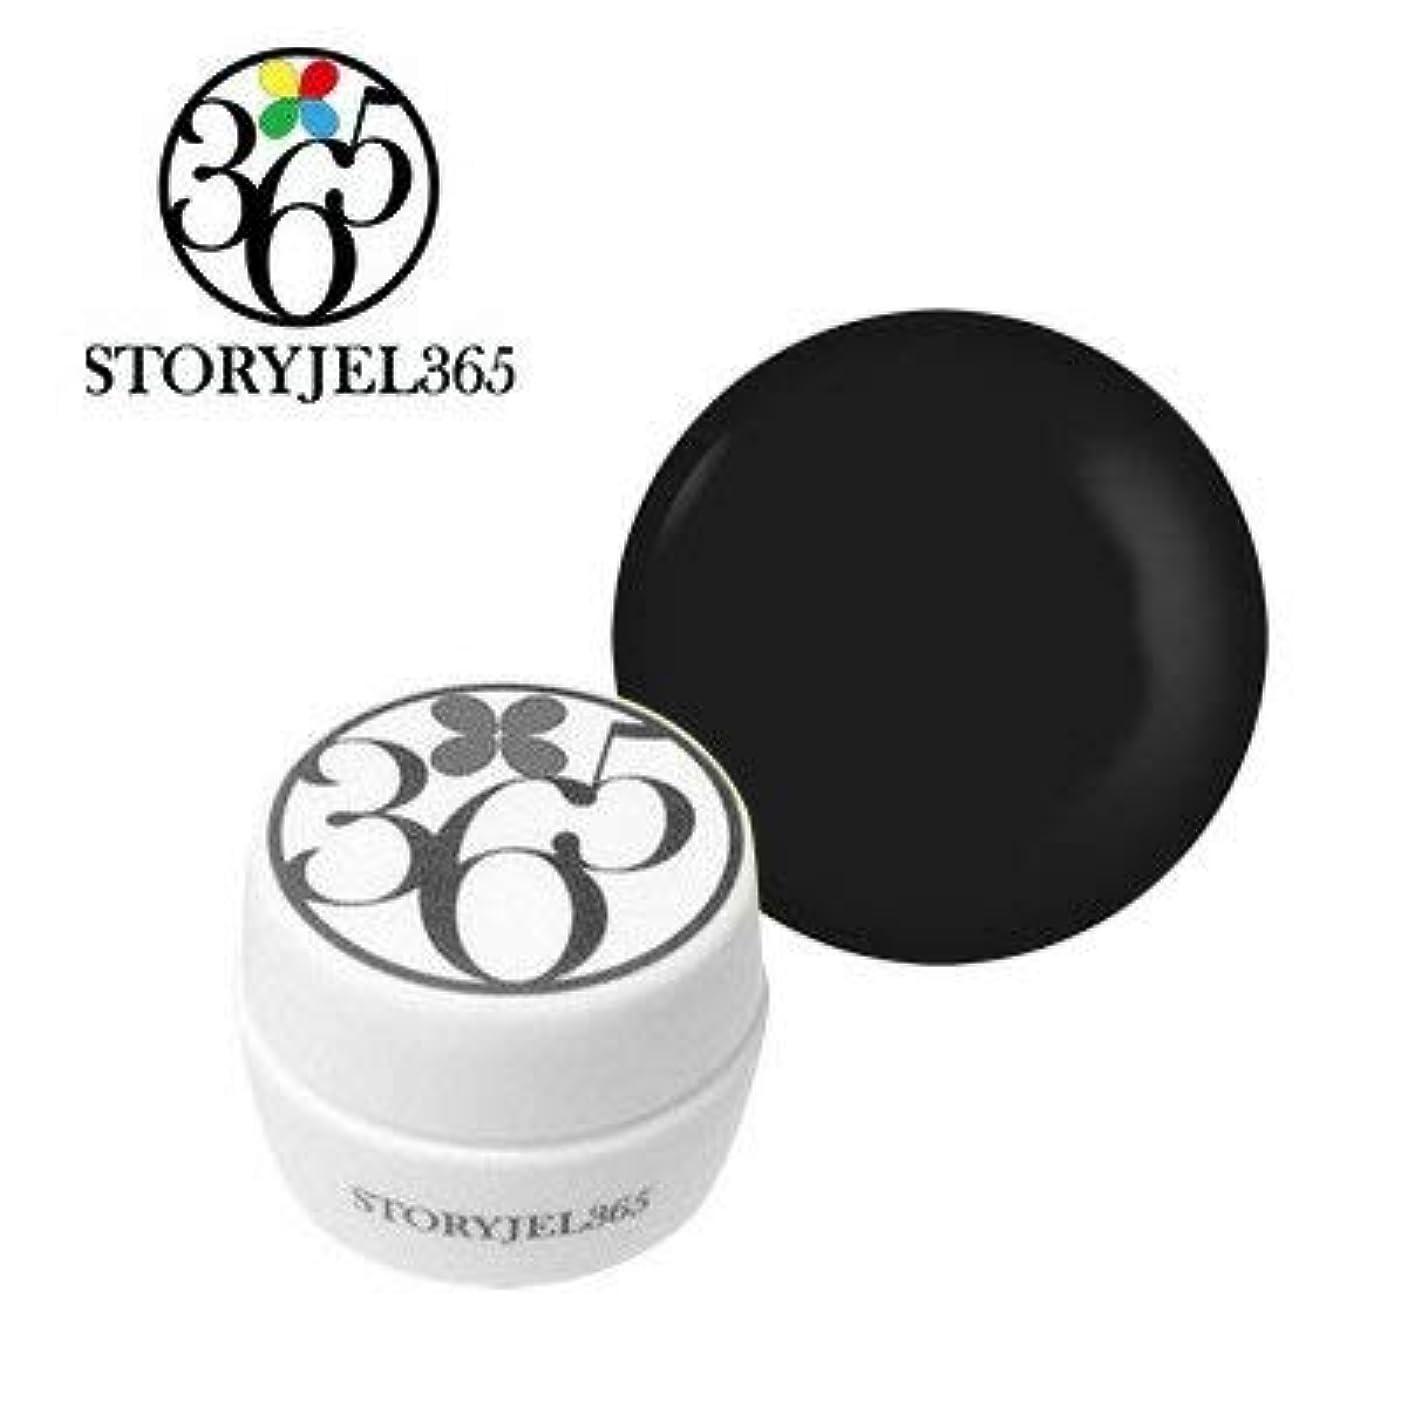 STORYJEL365 カラージェル 5g (ストーリージェル) SJS-301M-D 聖なる石